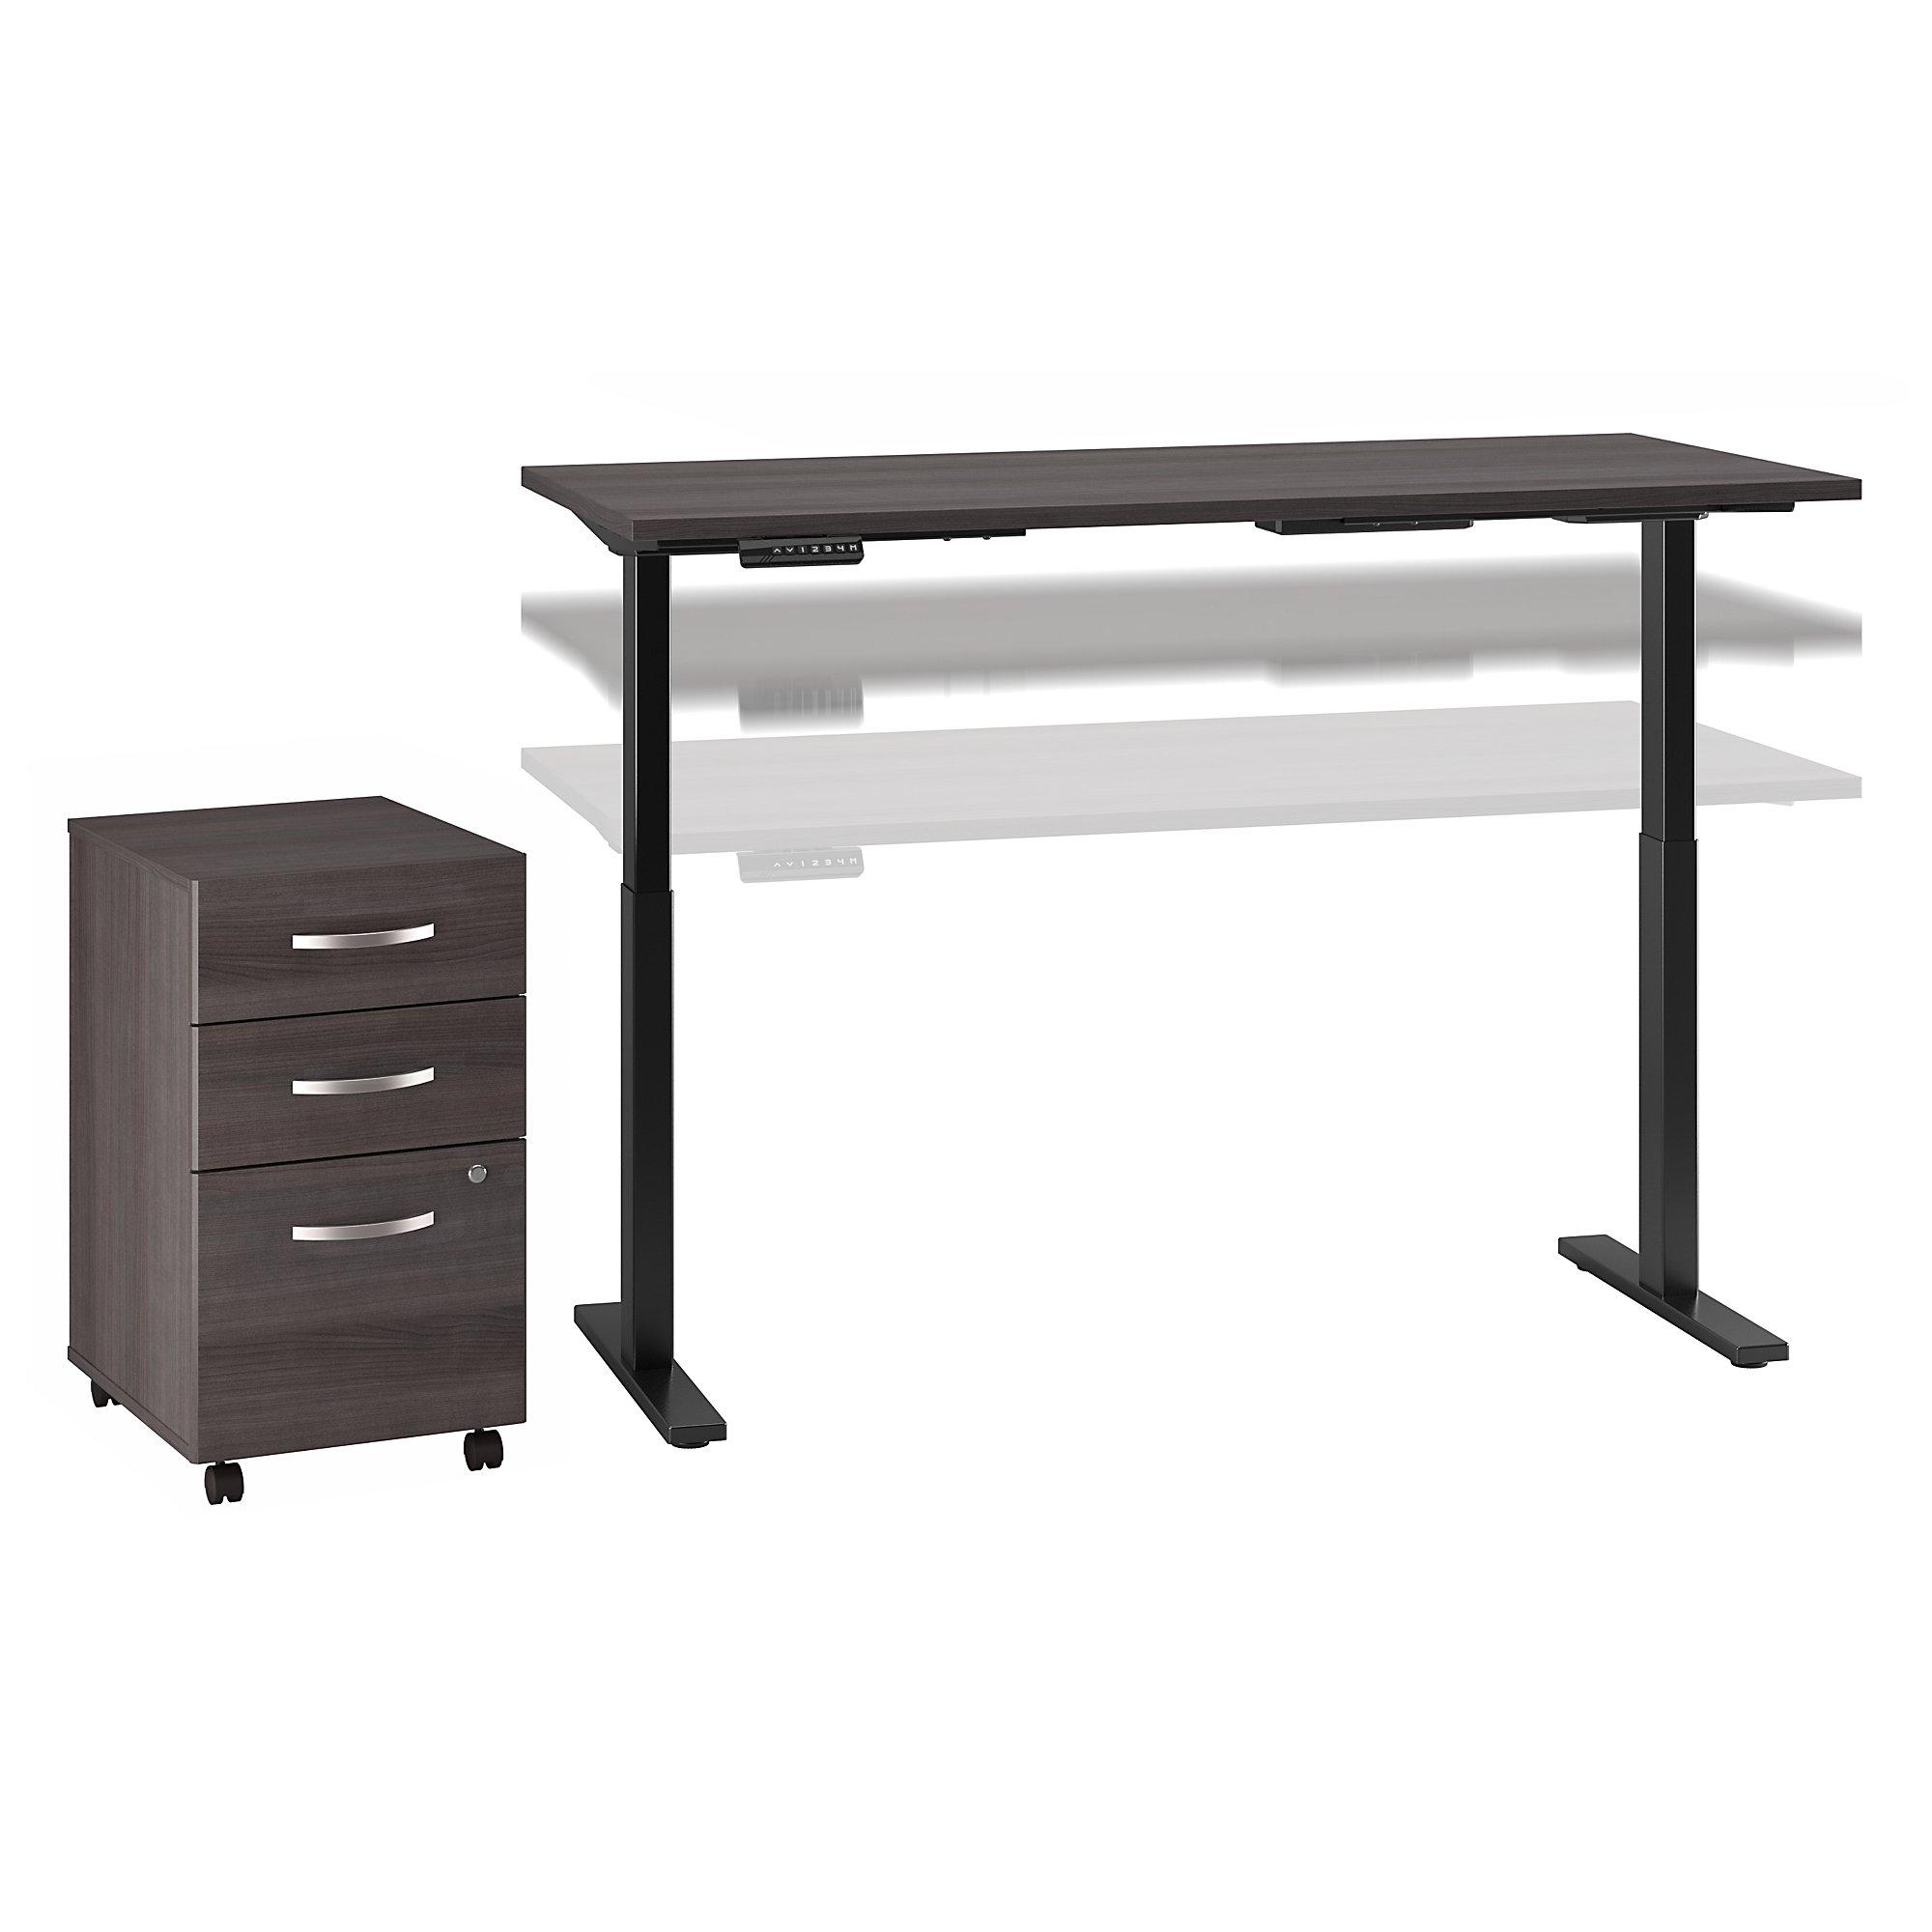 ergonomic desk and file cabinet set